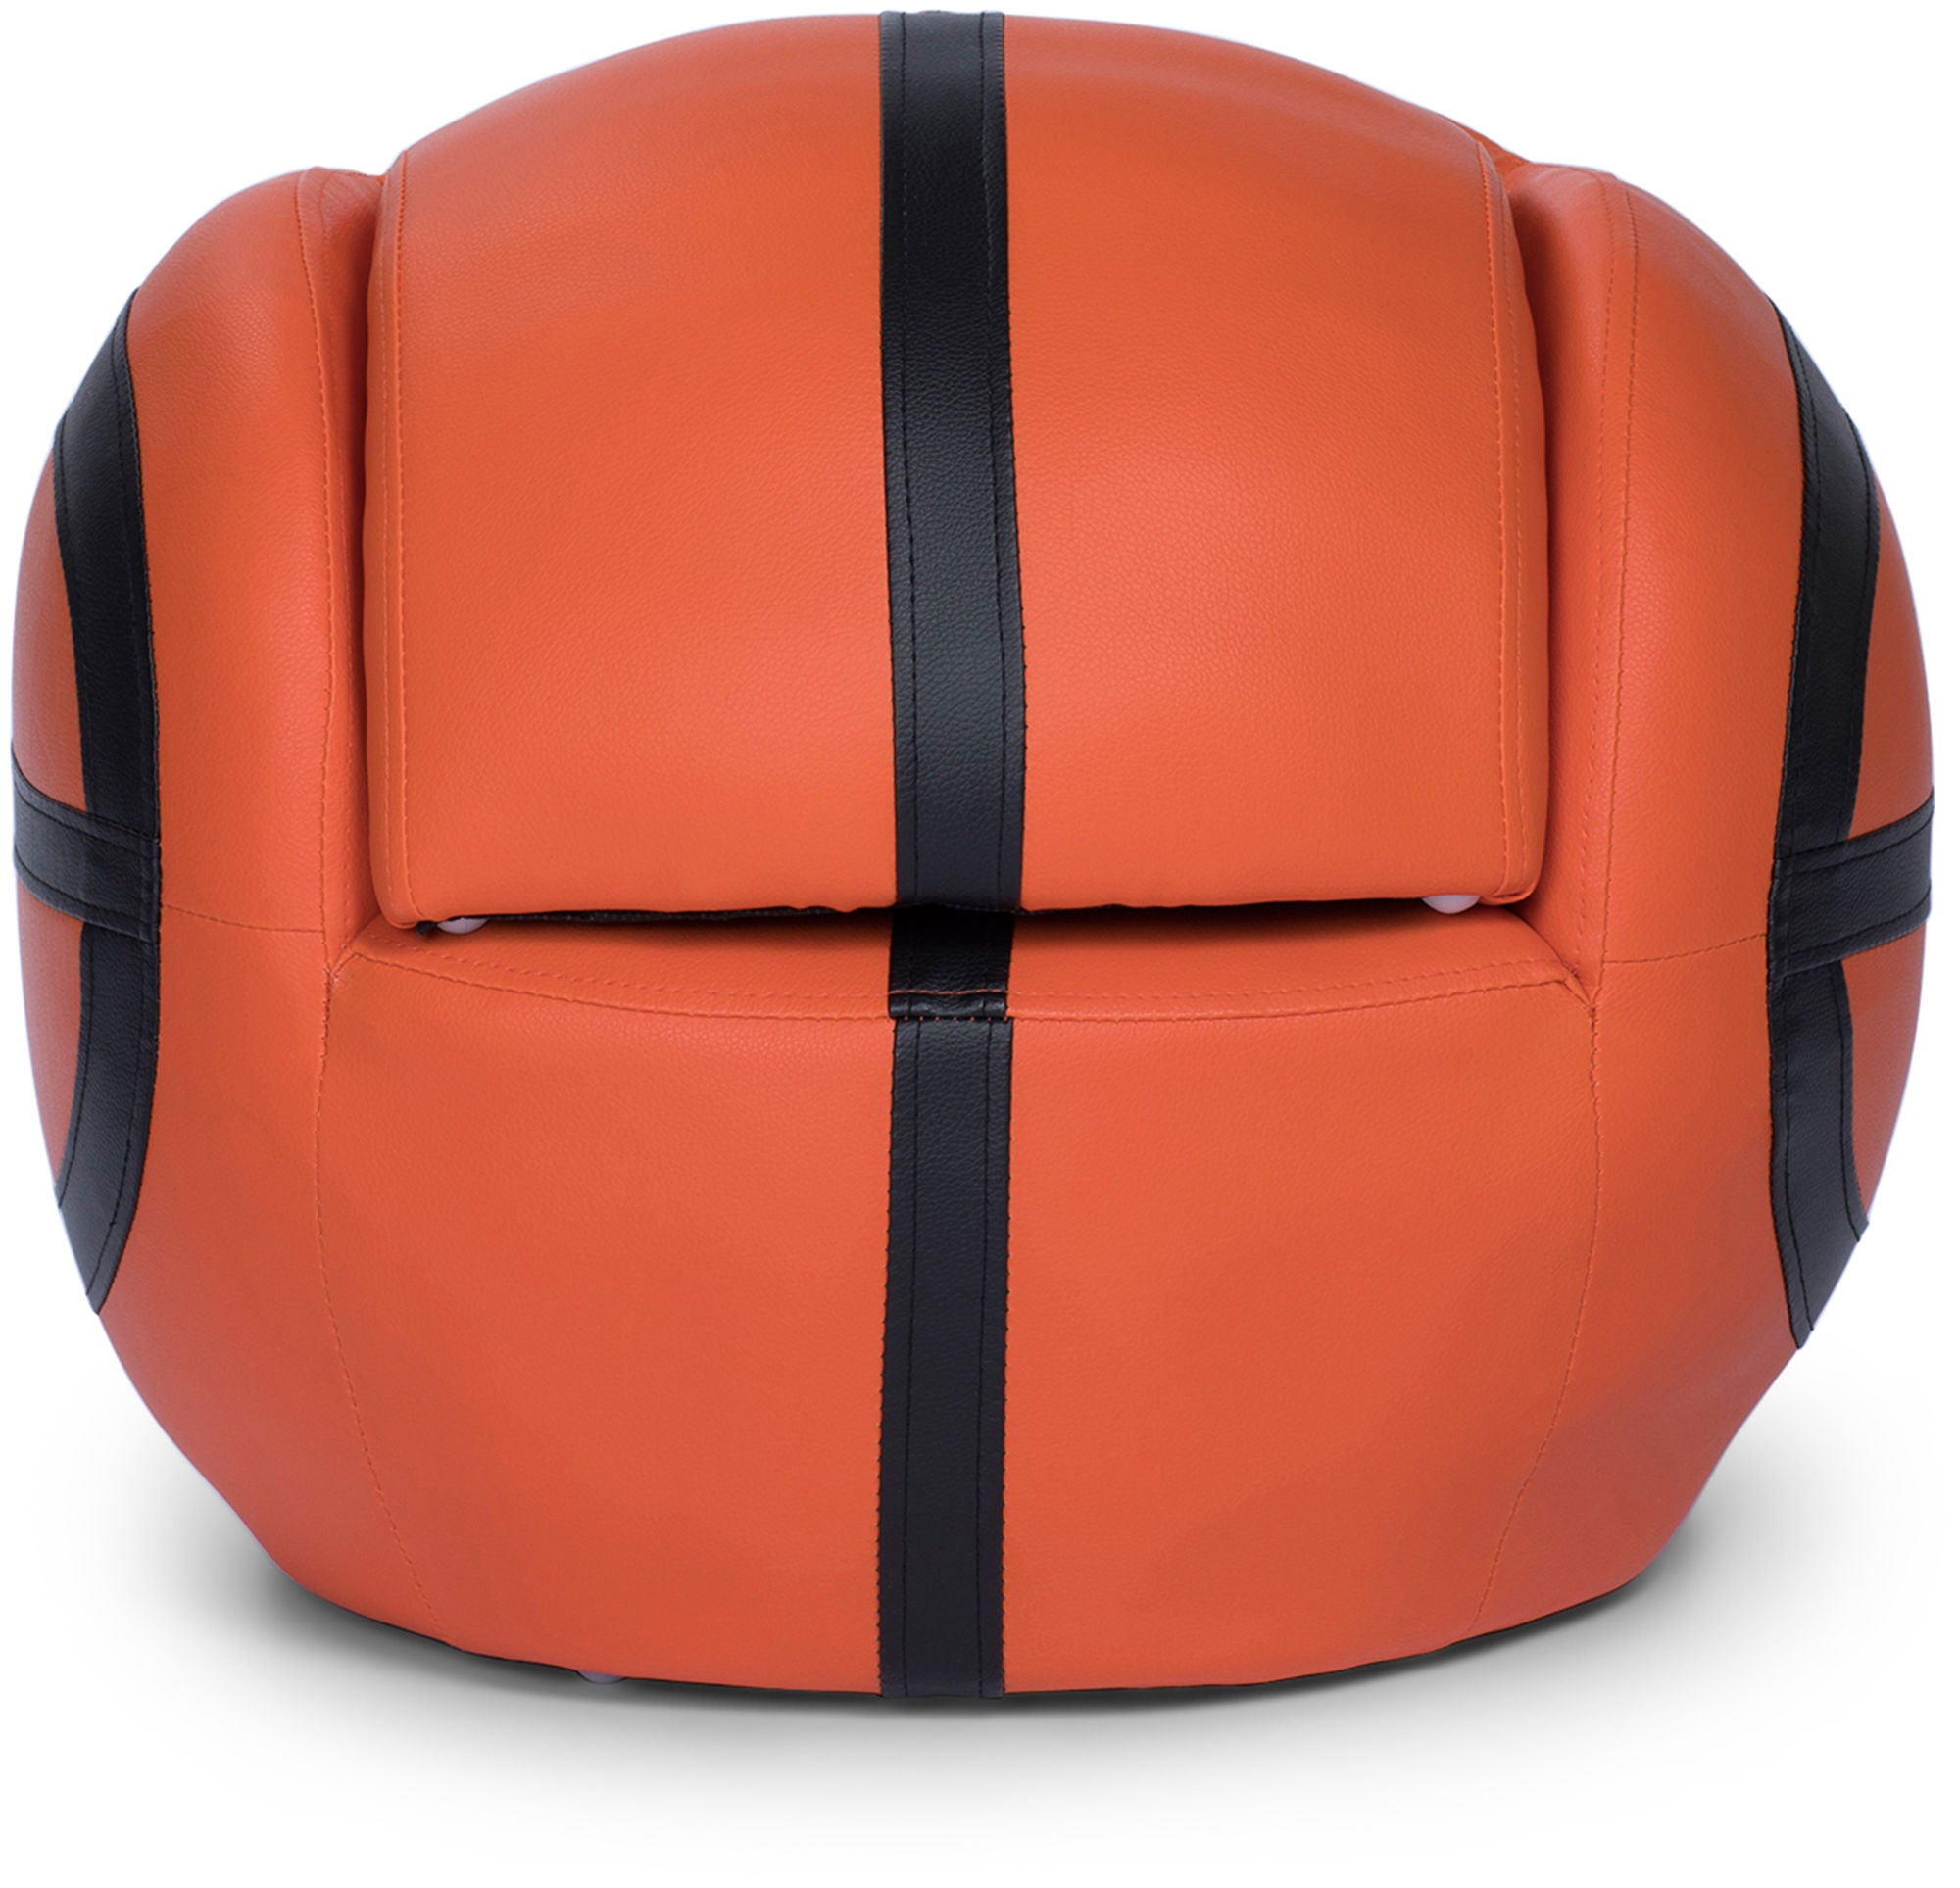 Woodlii Fåtölj Basketboll, Orange